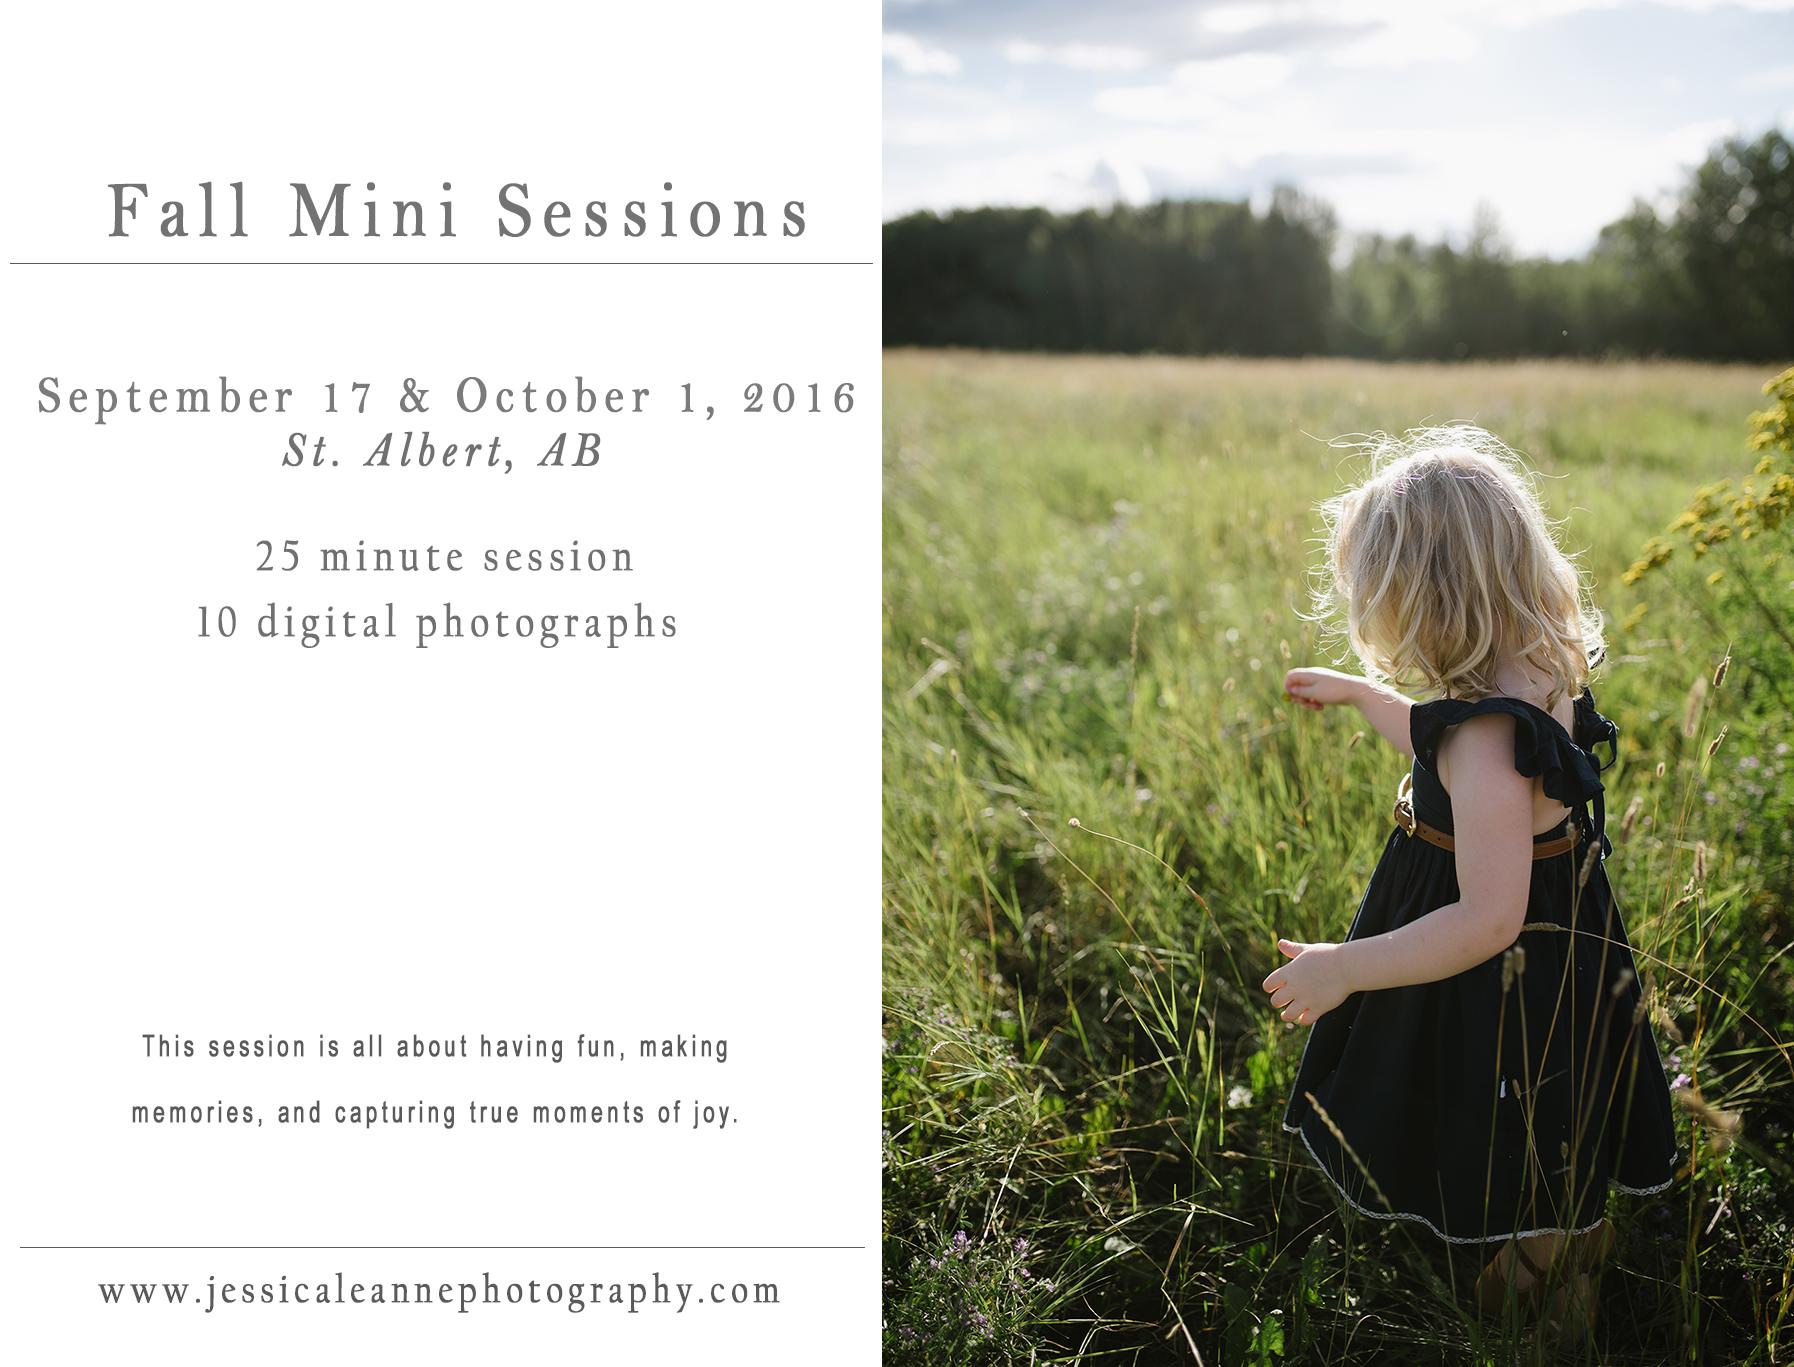 Fall Mini Sessions 2016, Jessica Leanne Photography, St. Albert AB